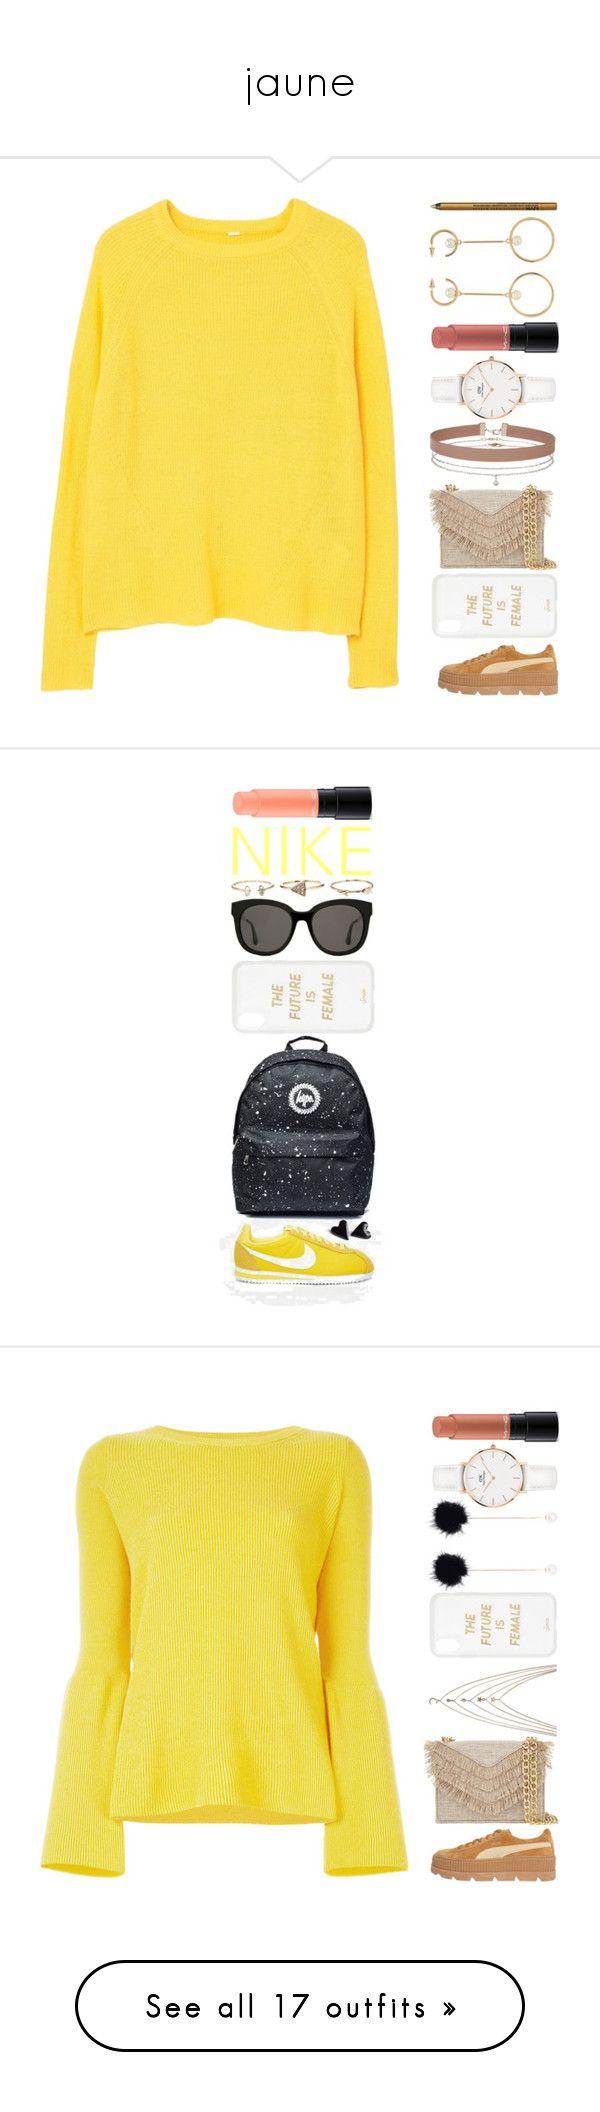 """jaune"" by elyblog ❤ liked on Polyvore featuring MANGO, Puma, Cynthia Rowley, Daniel Wellington, Sonix, Chloé, MAC Cosmetics, Miss Selfridge, NYX and Gentle Monster"